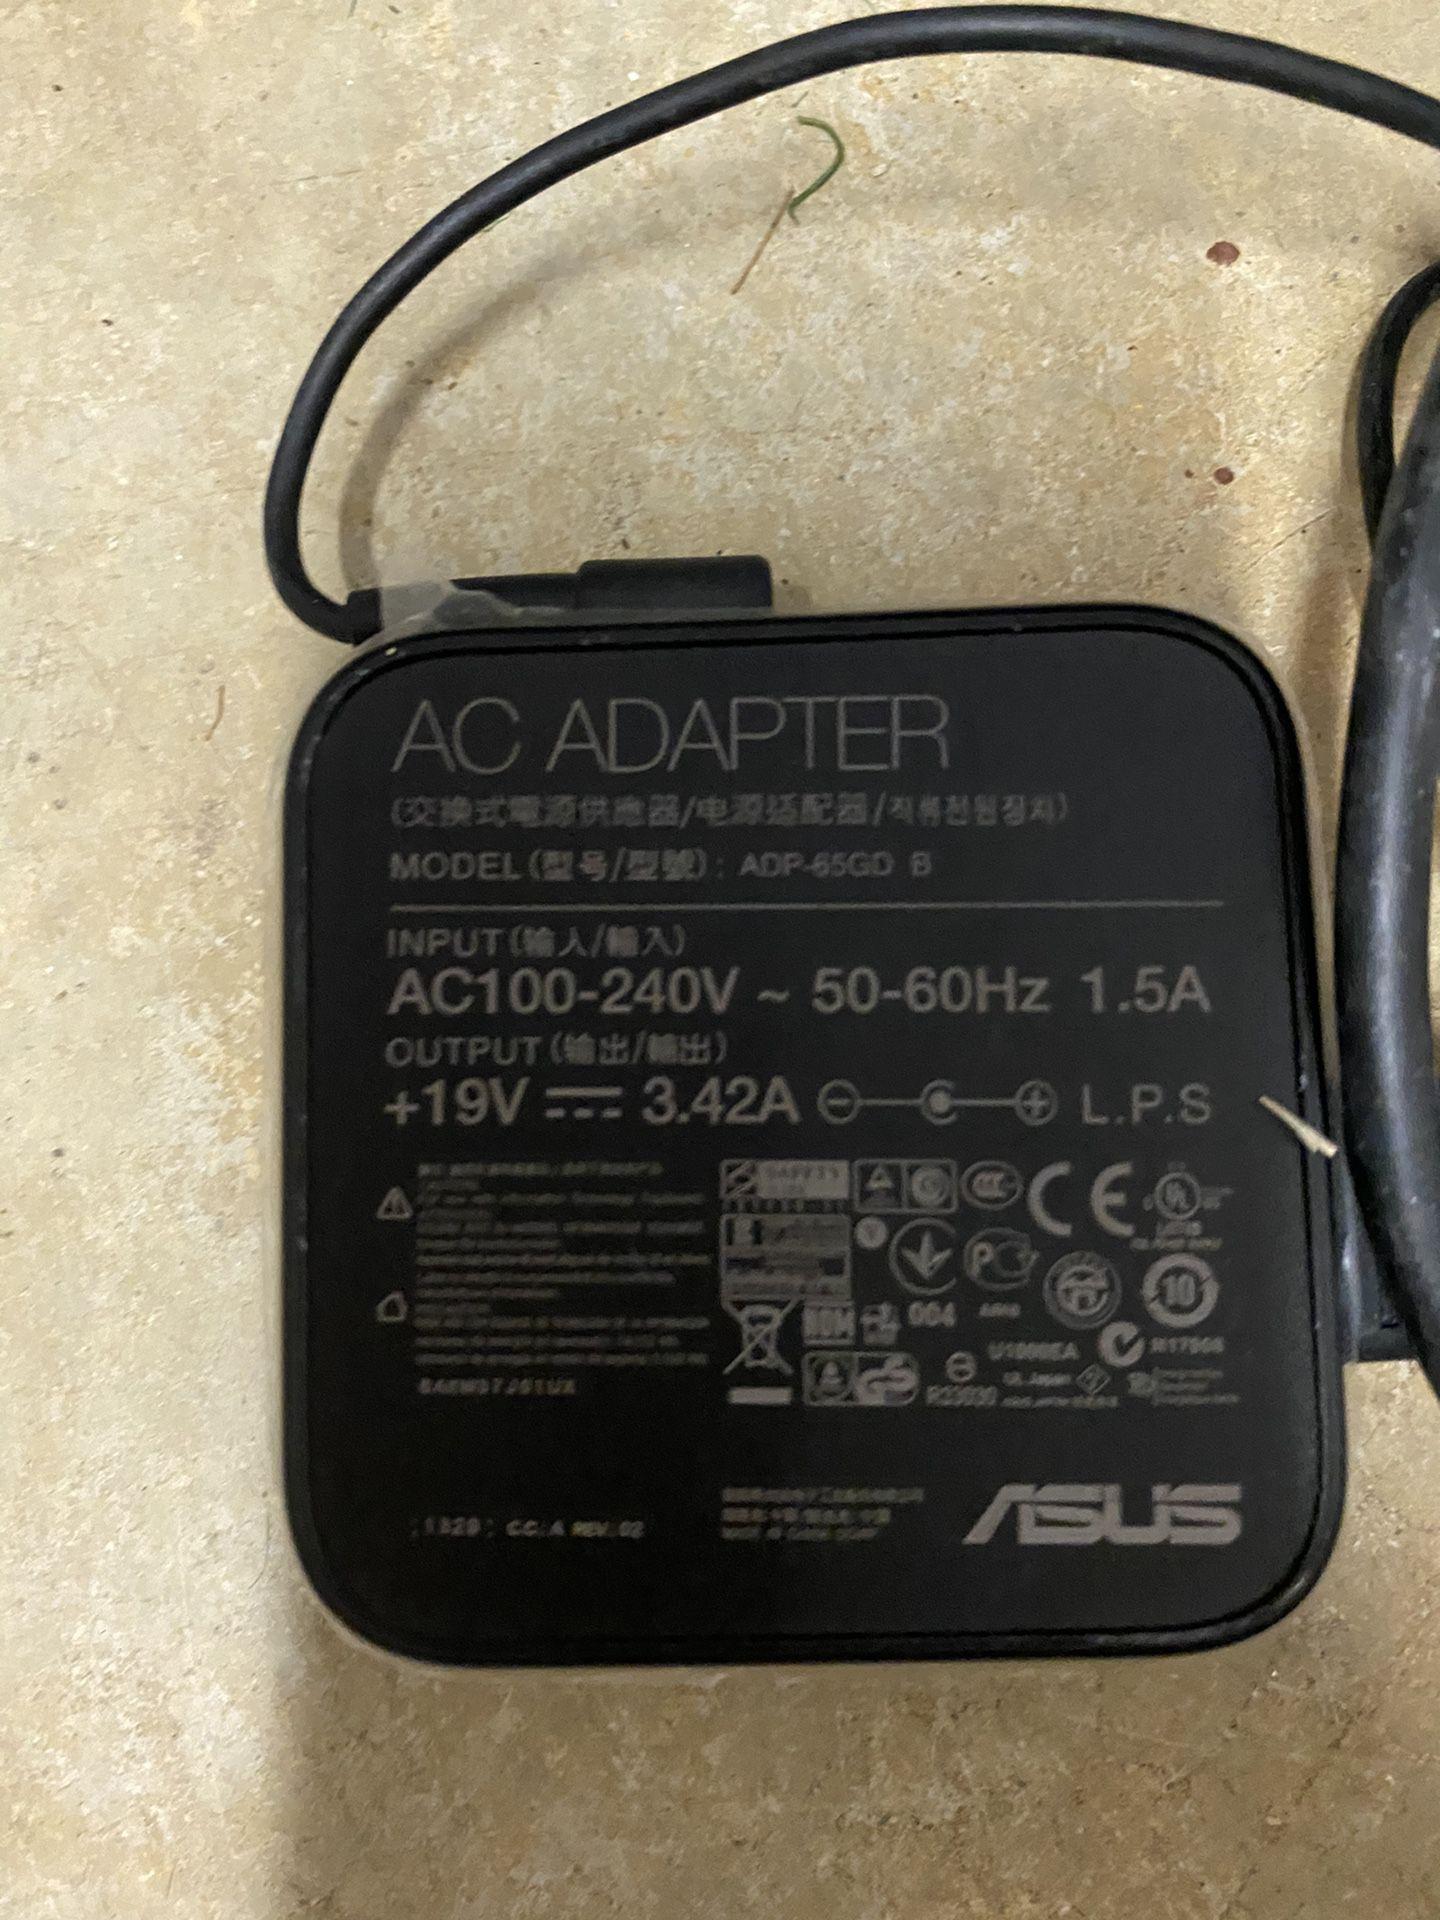 Asus Designing Series Power Cord